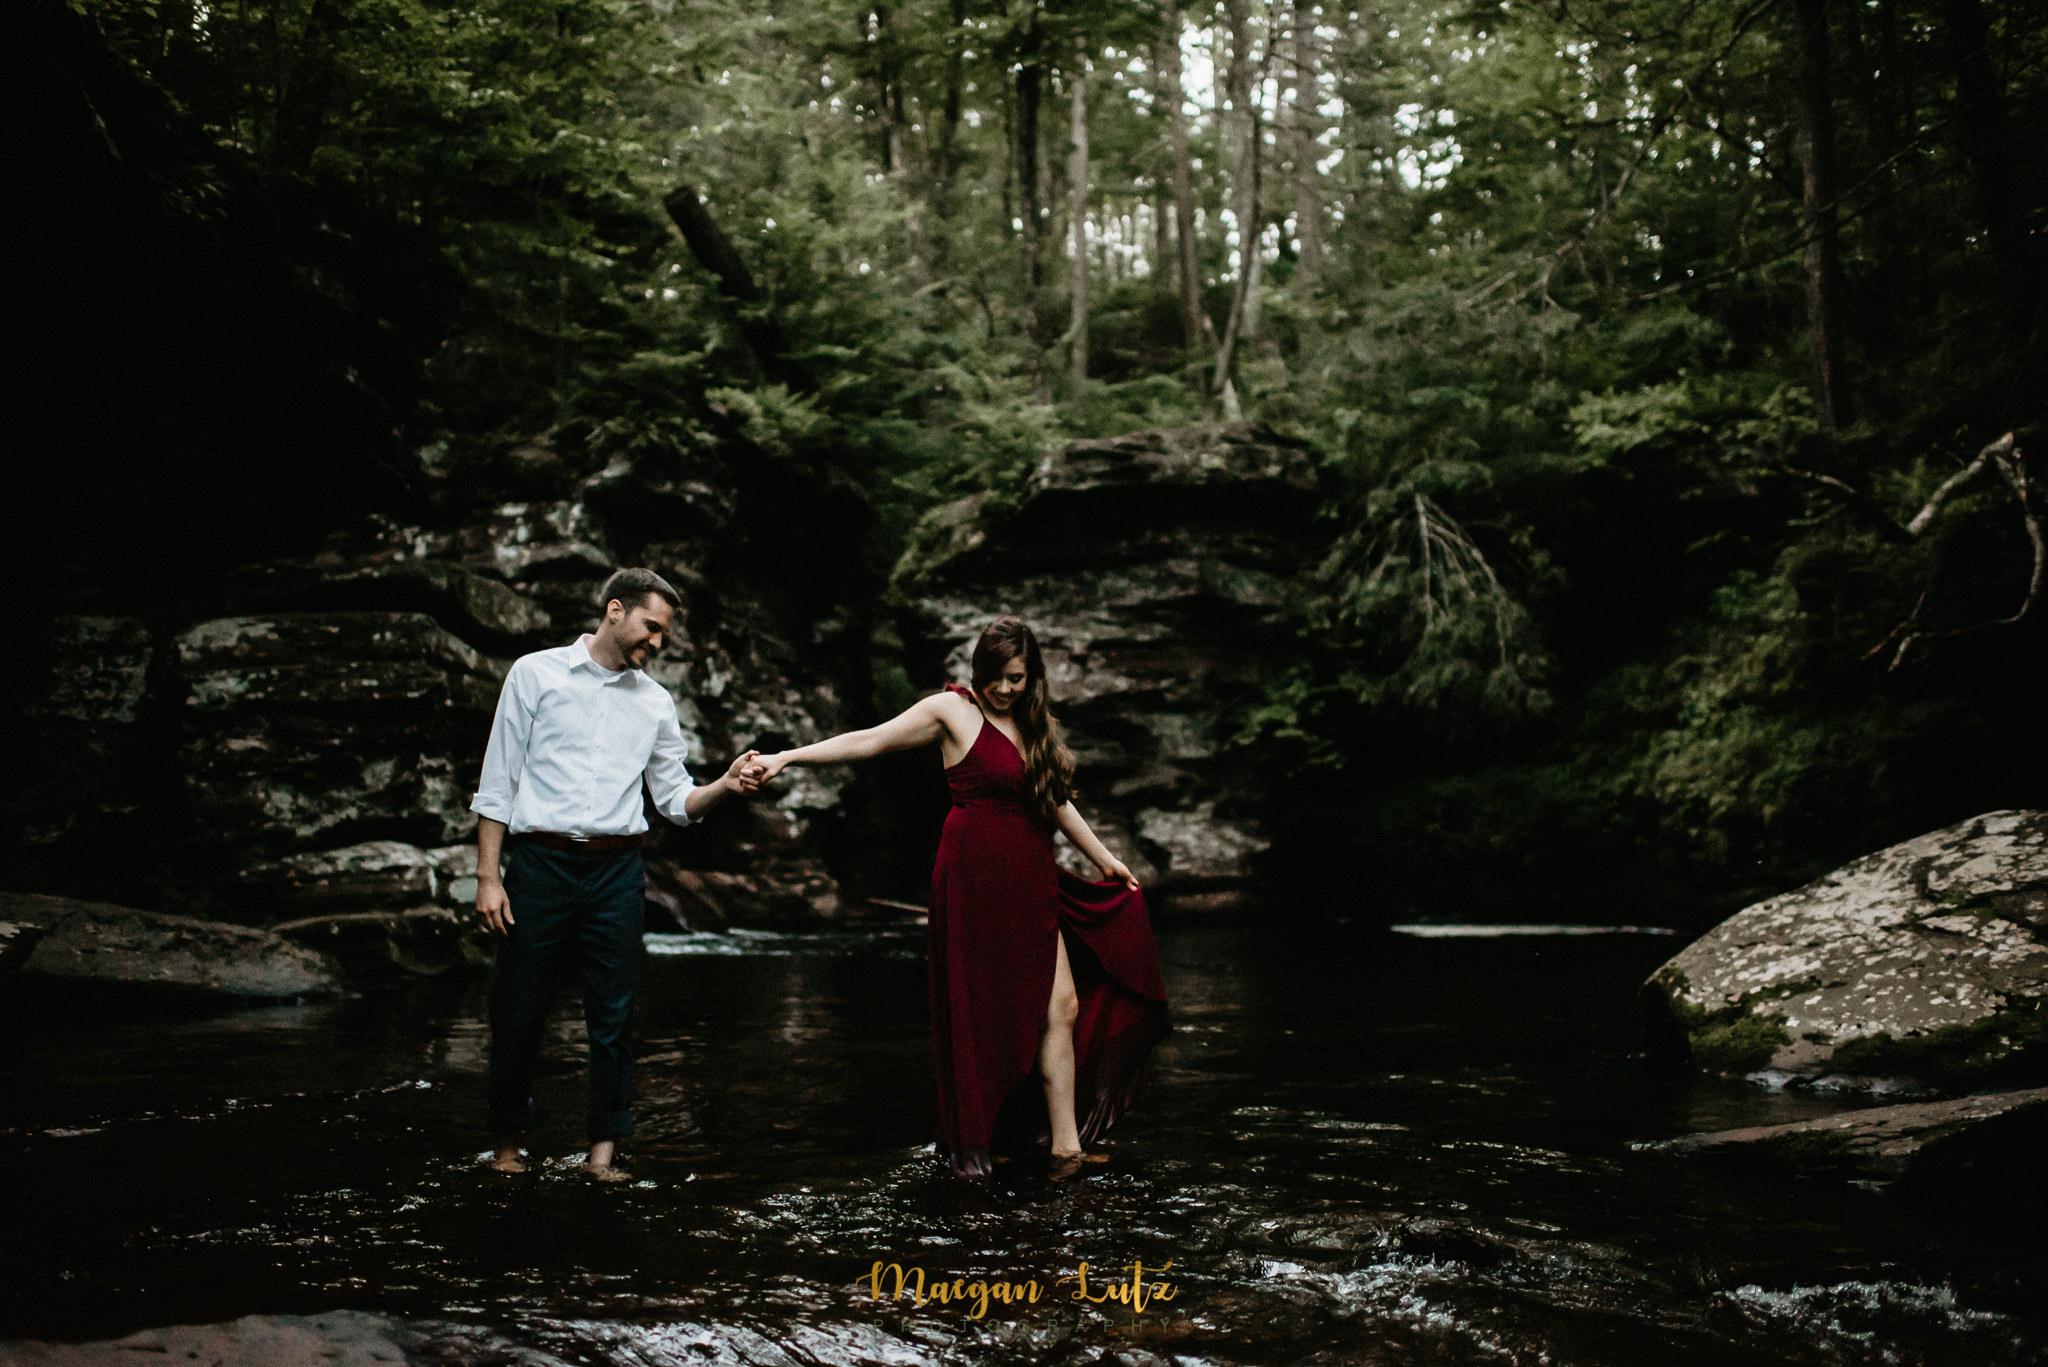 NEPA-Engagement-Wedding-Photographer-Session-at-Ricketts-Glen-State-Park-49.jpg